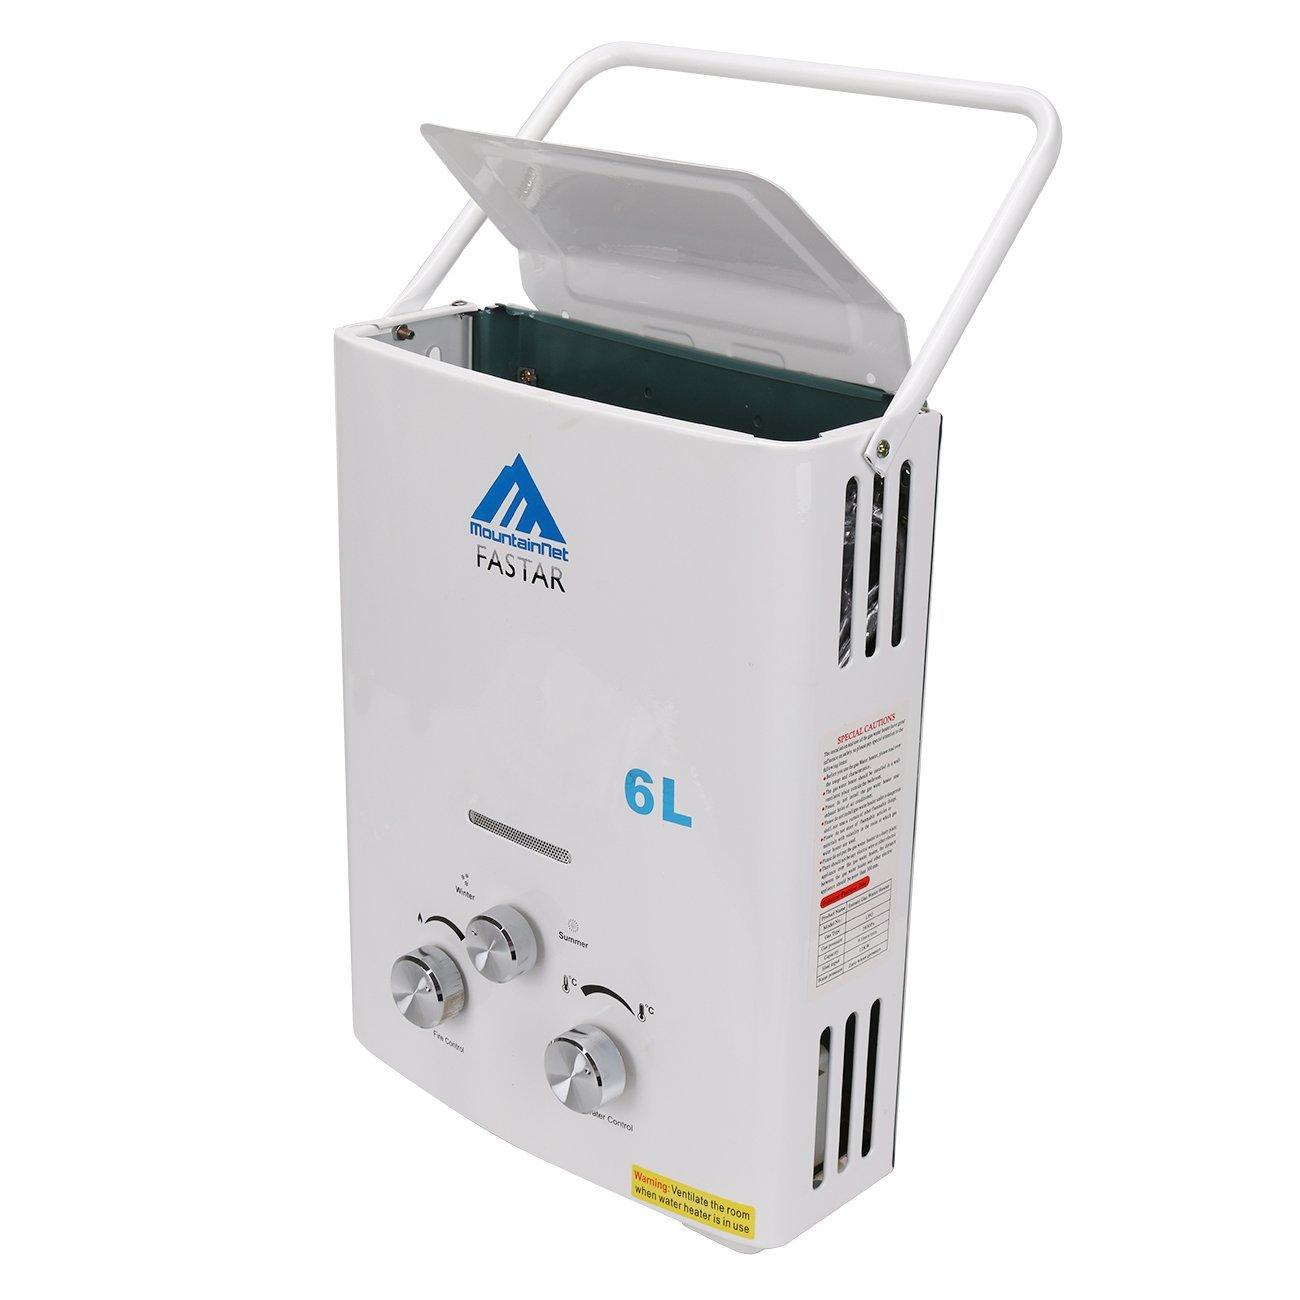 ridgeyard al aire libre portátil 6L (1.6gpm) LP Gas portátil ligero instantáneo calentador calentador de agua caldera y al aire libre ducha + ducha cabeza ...